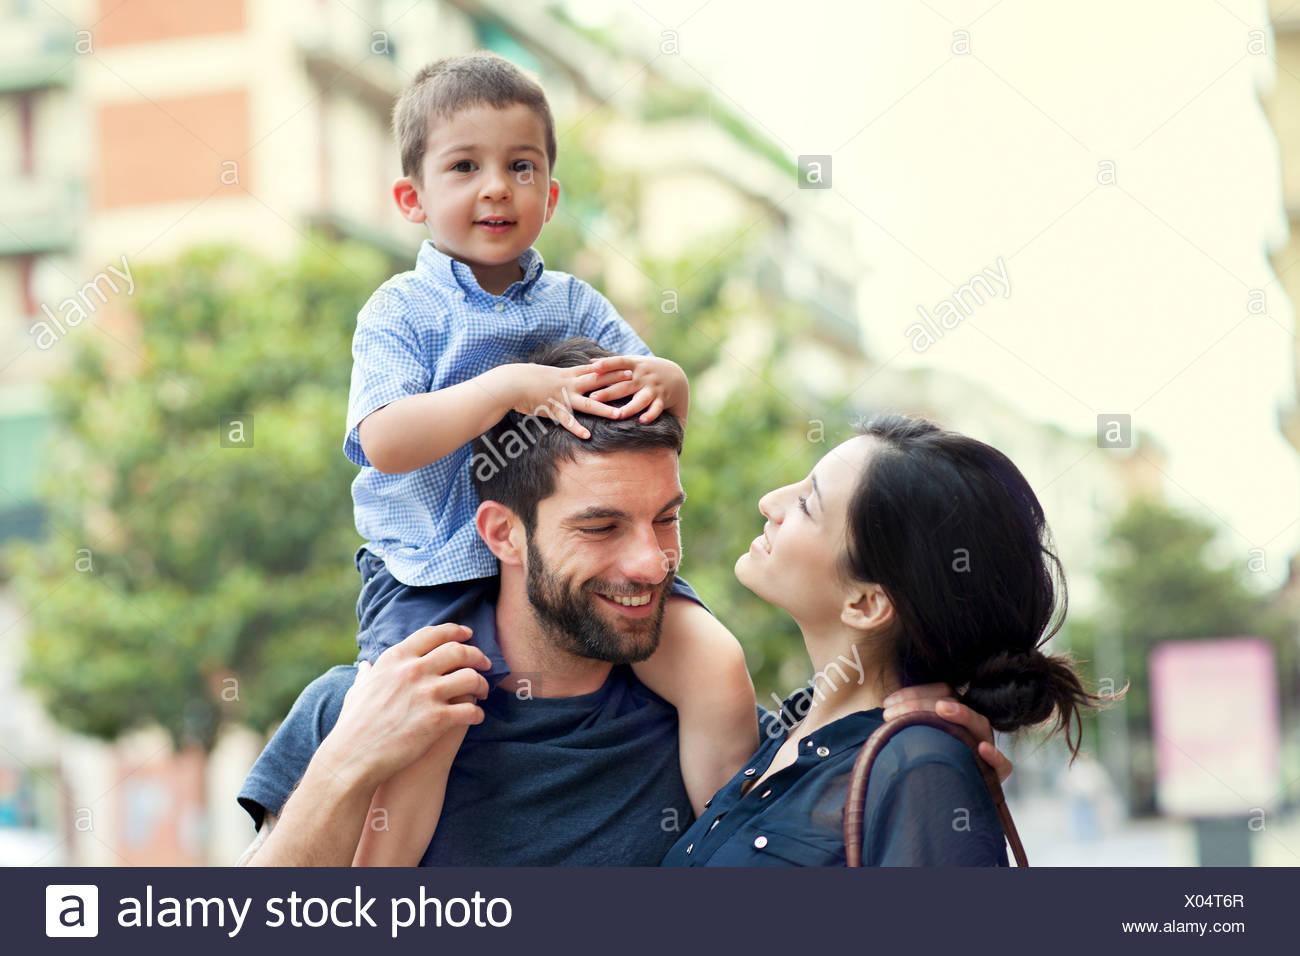 Vater mit Sohn auf Schultern mit Frau Stockbild